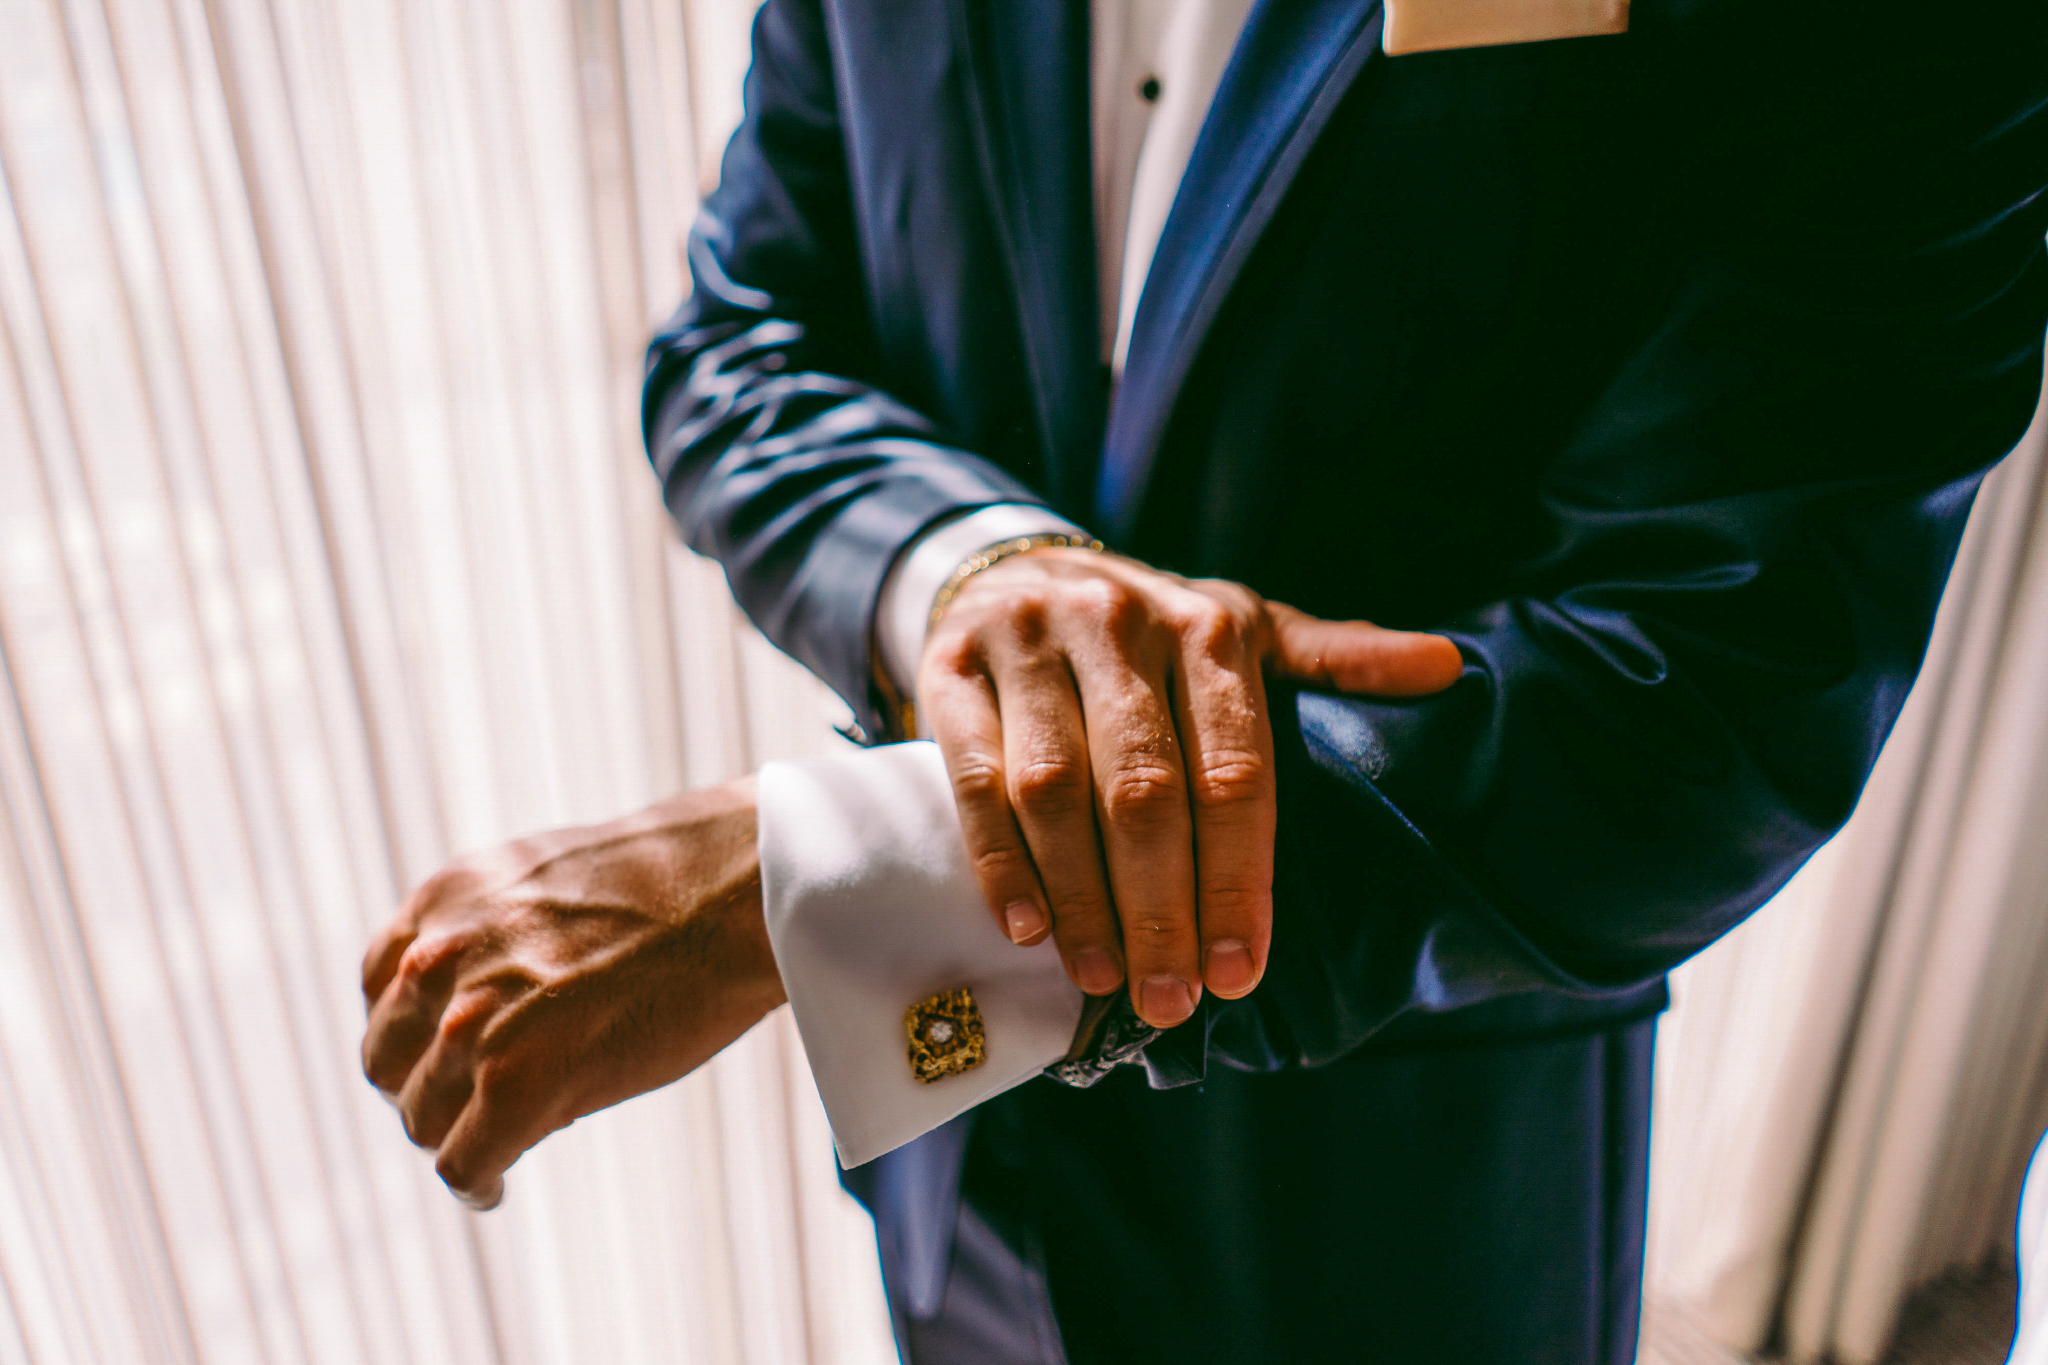 san diego wedding   photographer | man revealing sleeve cuffs by the window